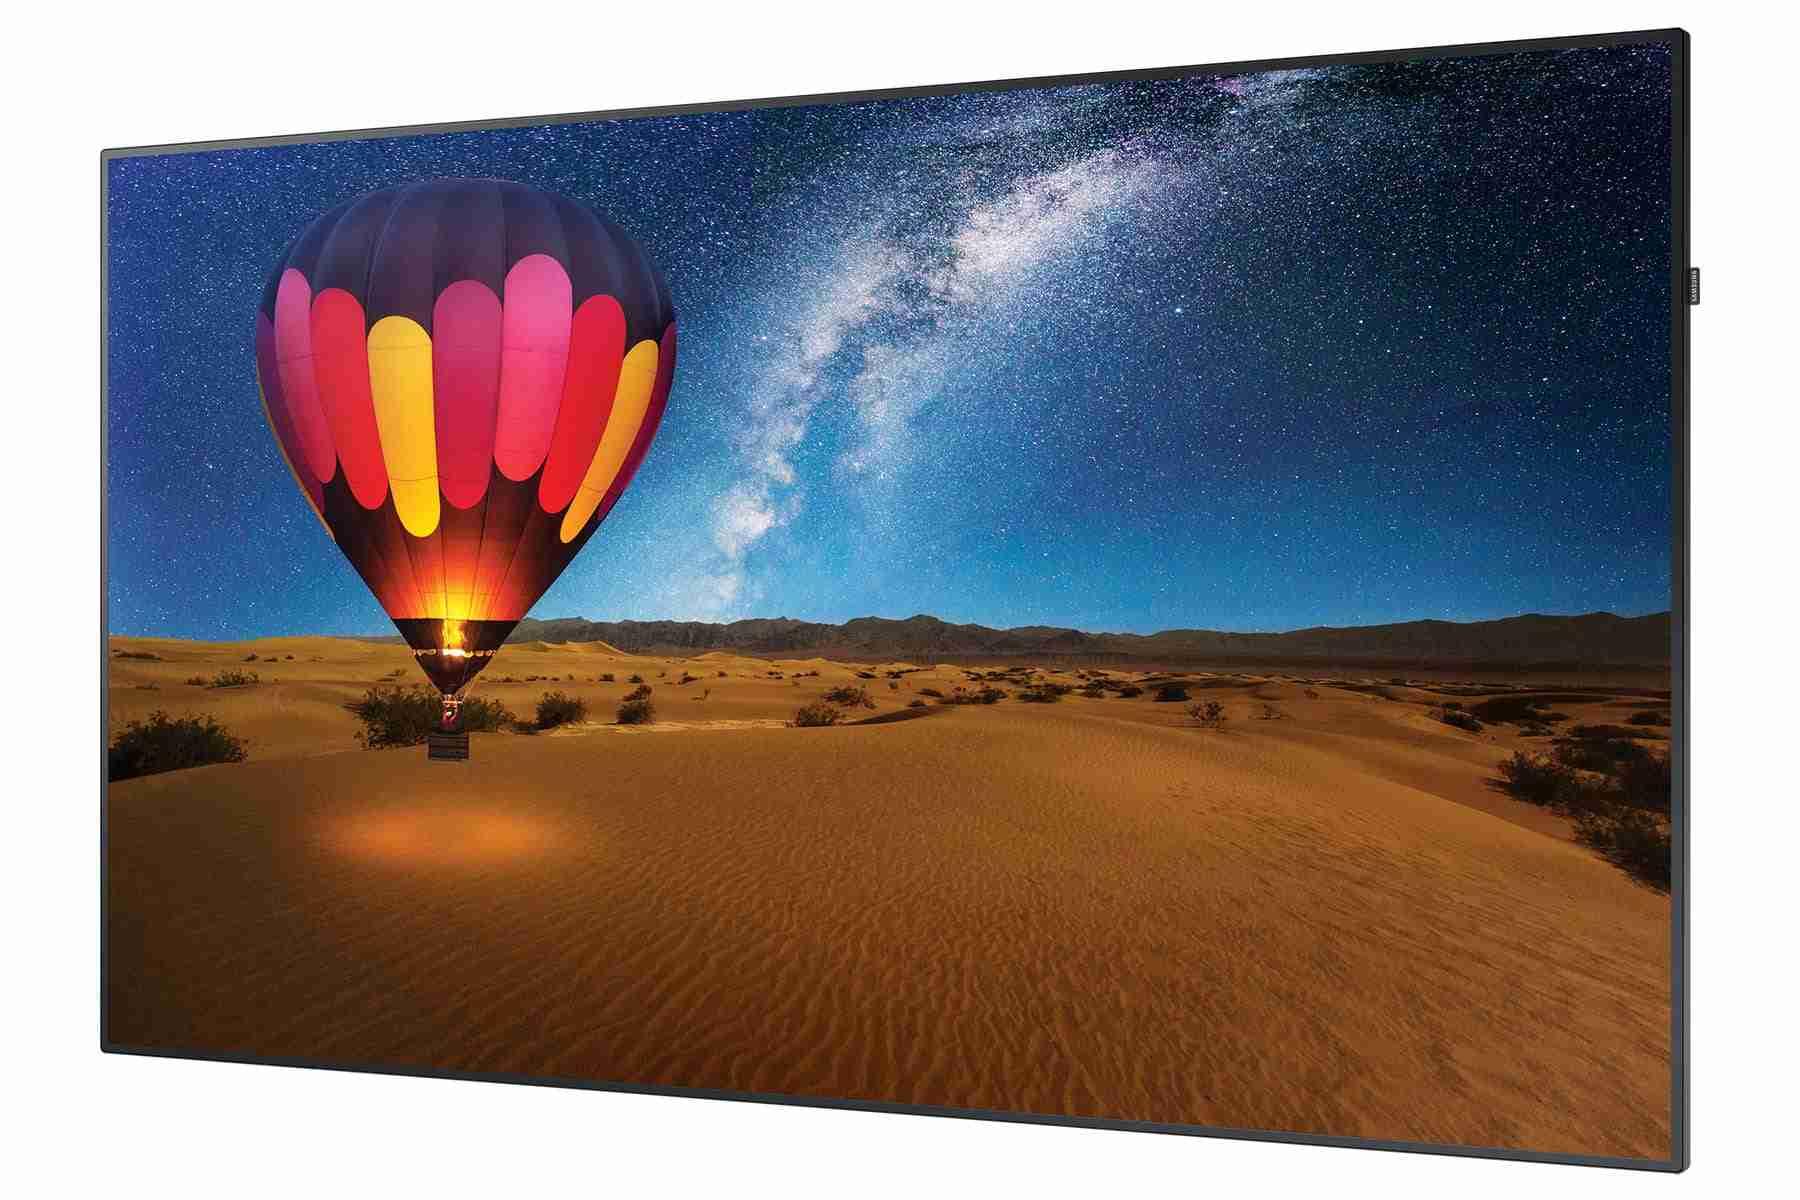 Samsung LED QM98F Display Signage-Pakistan 3